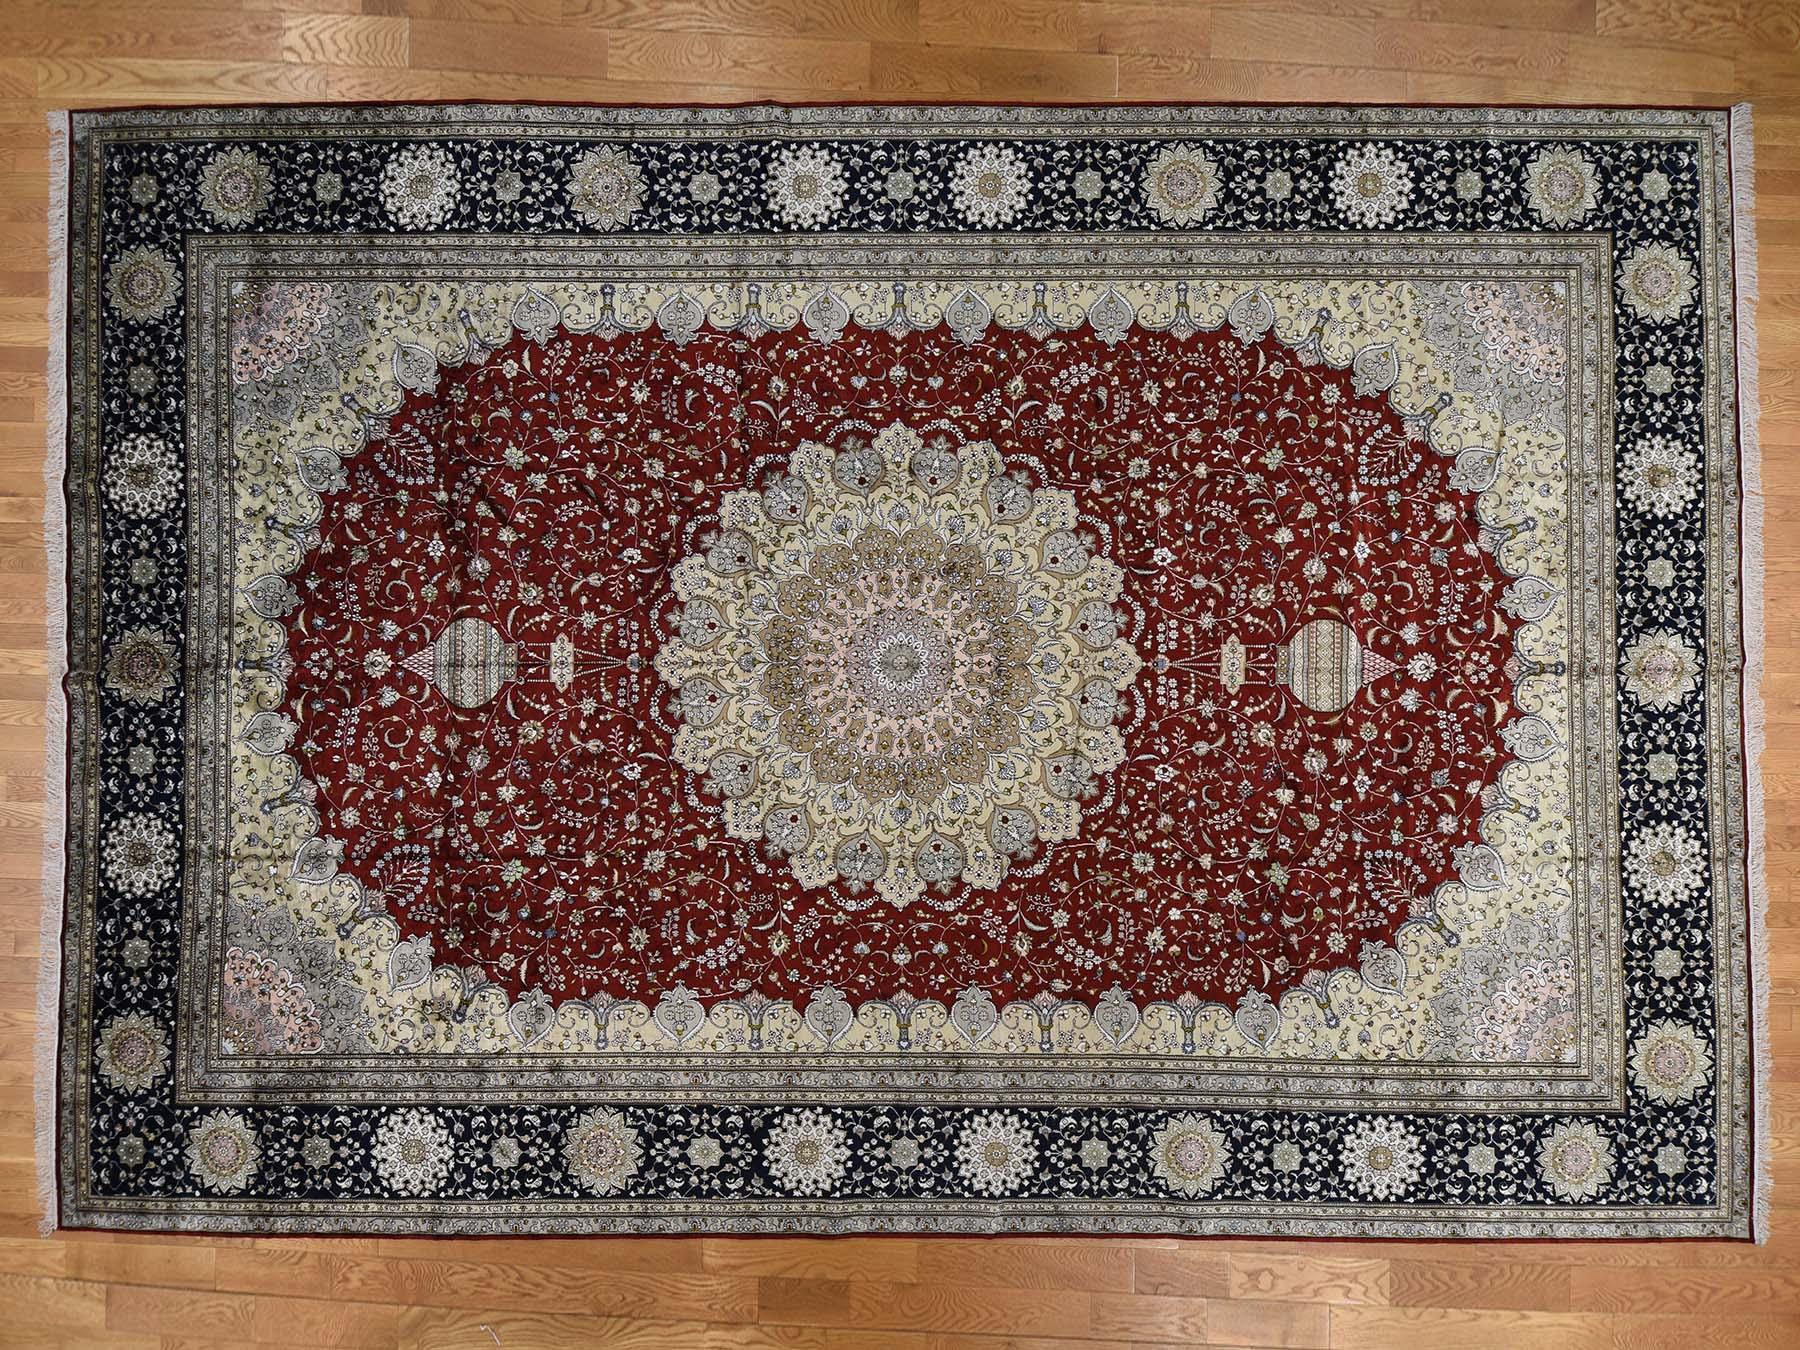 12-x18- Silken Kashan 250 kpsi Oversize Hand-Knotted Oriental Rug